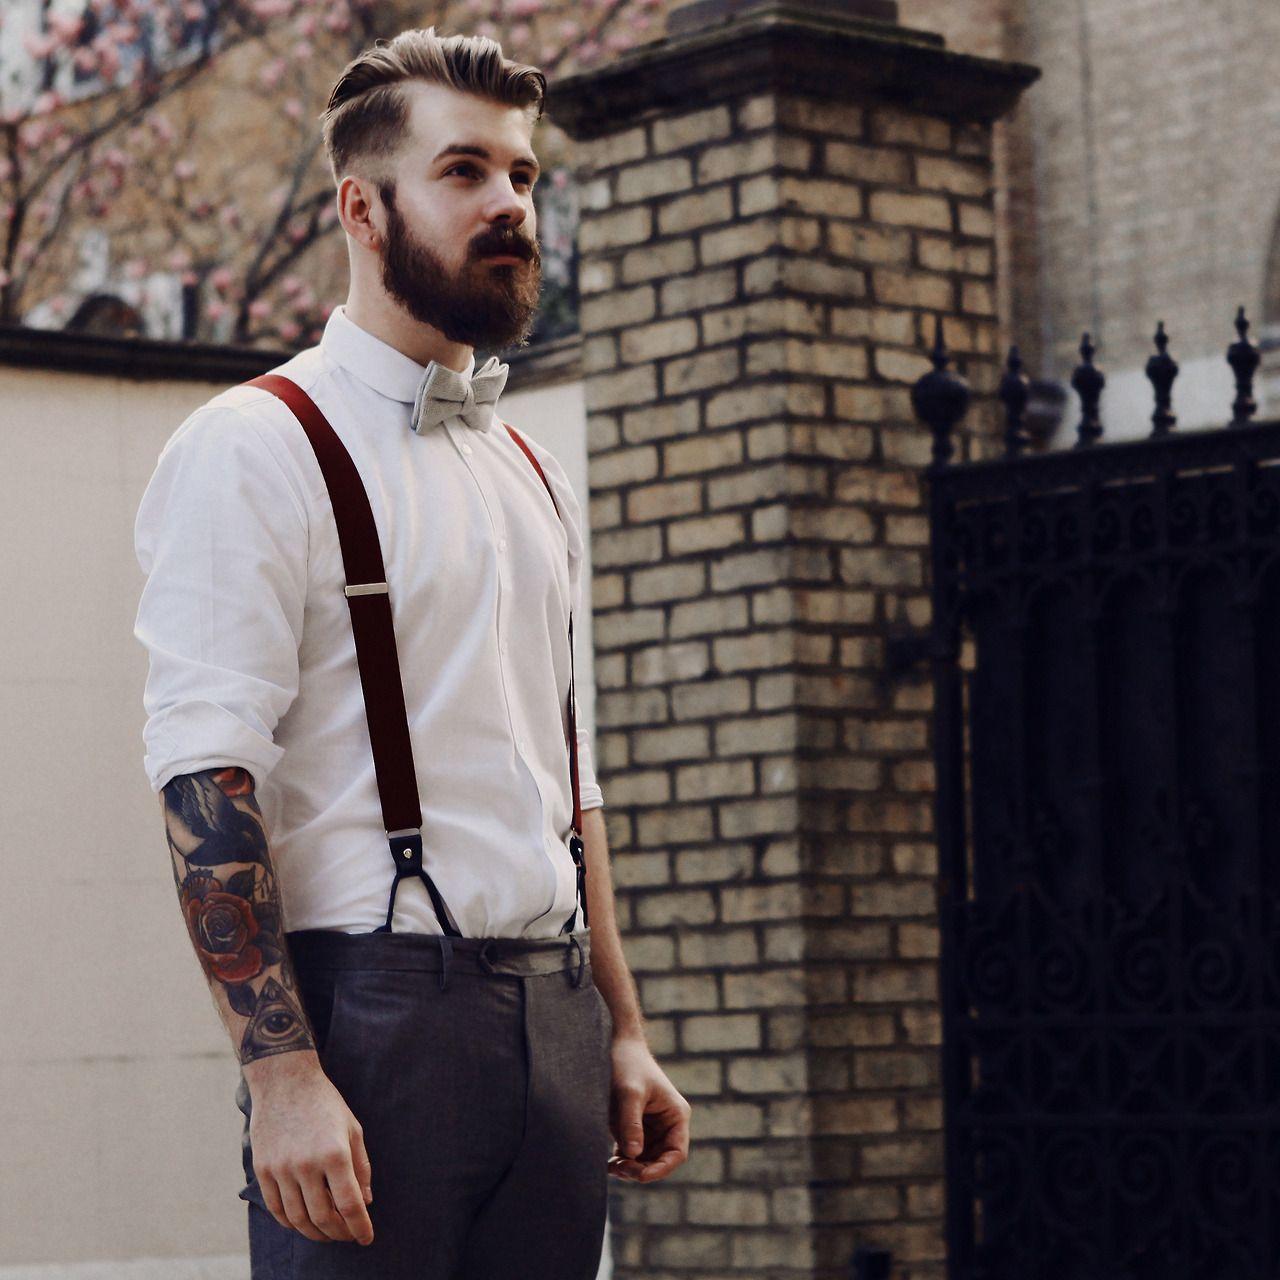 Beard And Mustache Beards Bearded Man Men Mens Style Suspenders